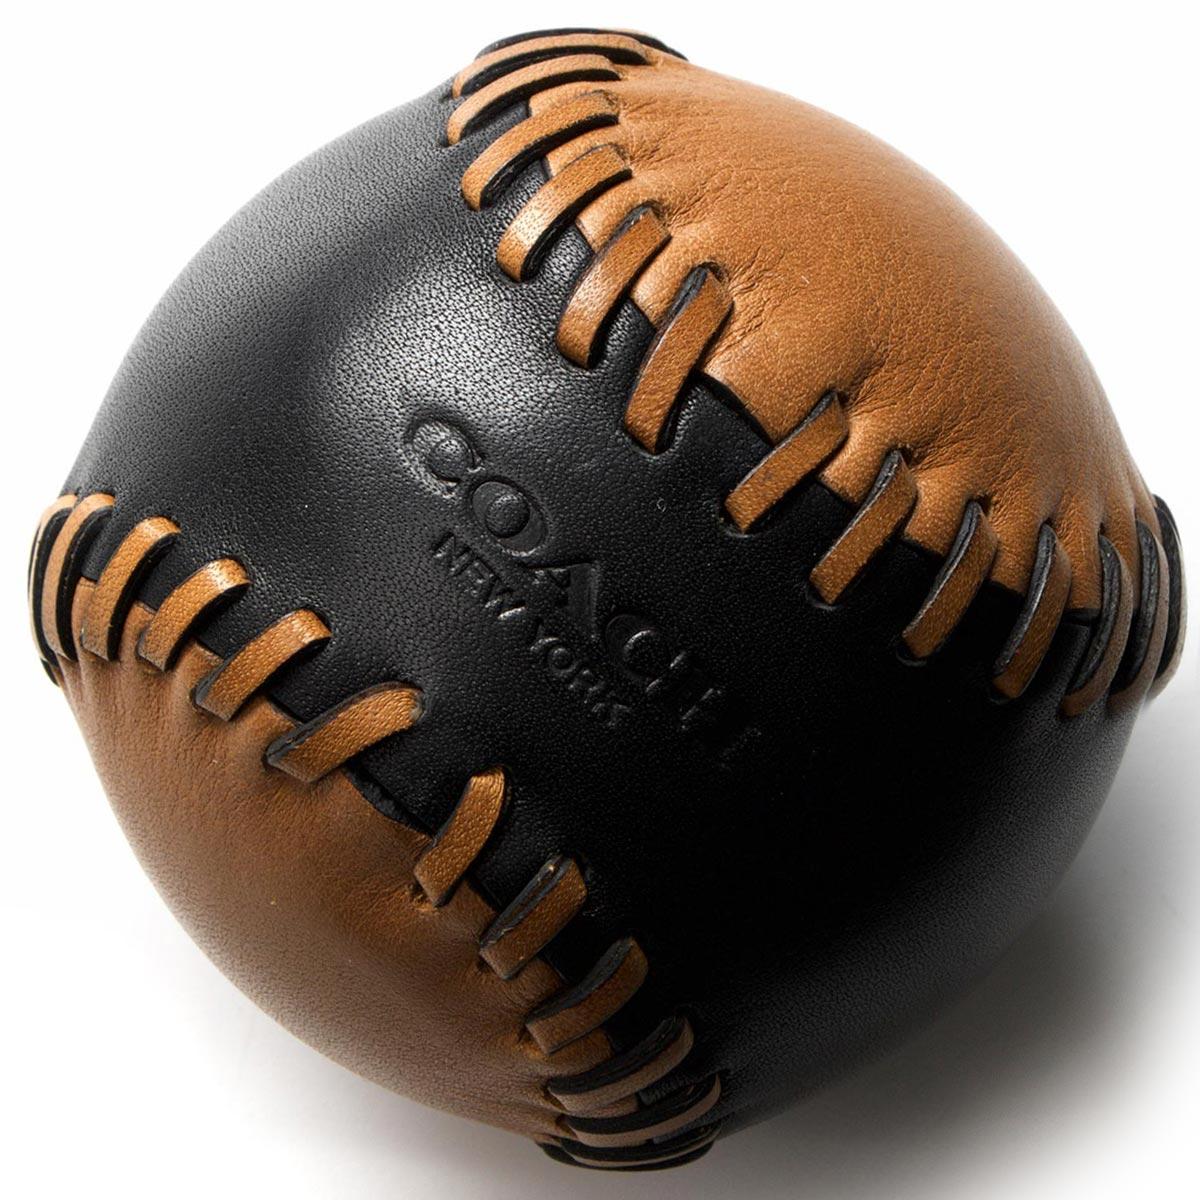 【X'masSALE】コーチ ソフトボール/インテリア小物 メンズ ベースボール ステッチ ブラック&サドルブラウン F65249 BKSD COACH